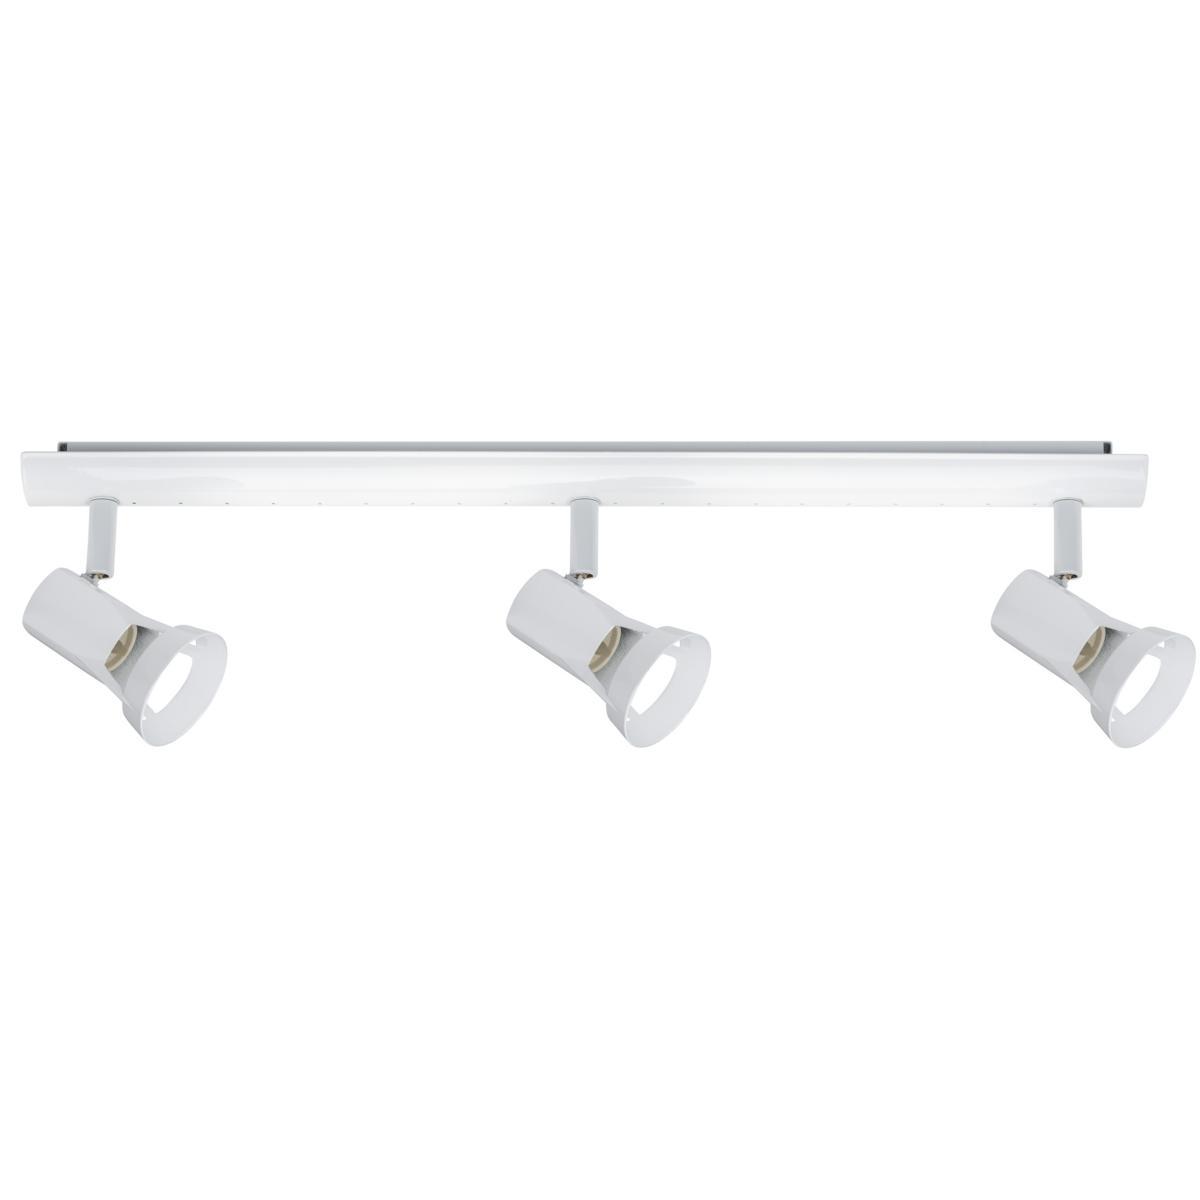 plafonnier teja paulmann 3 spots gu10 230v blanc 66704. Black Bedroom Furniture Sets. Home Design Ideas